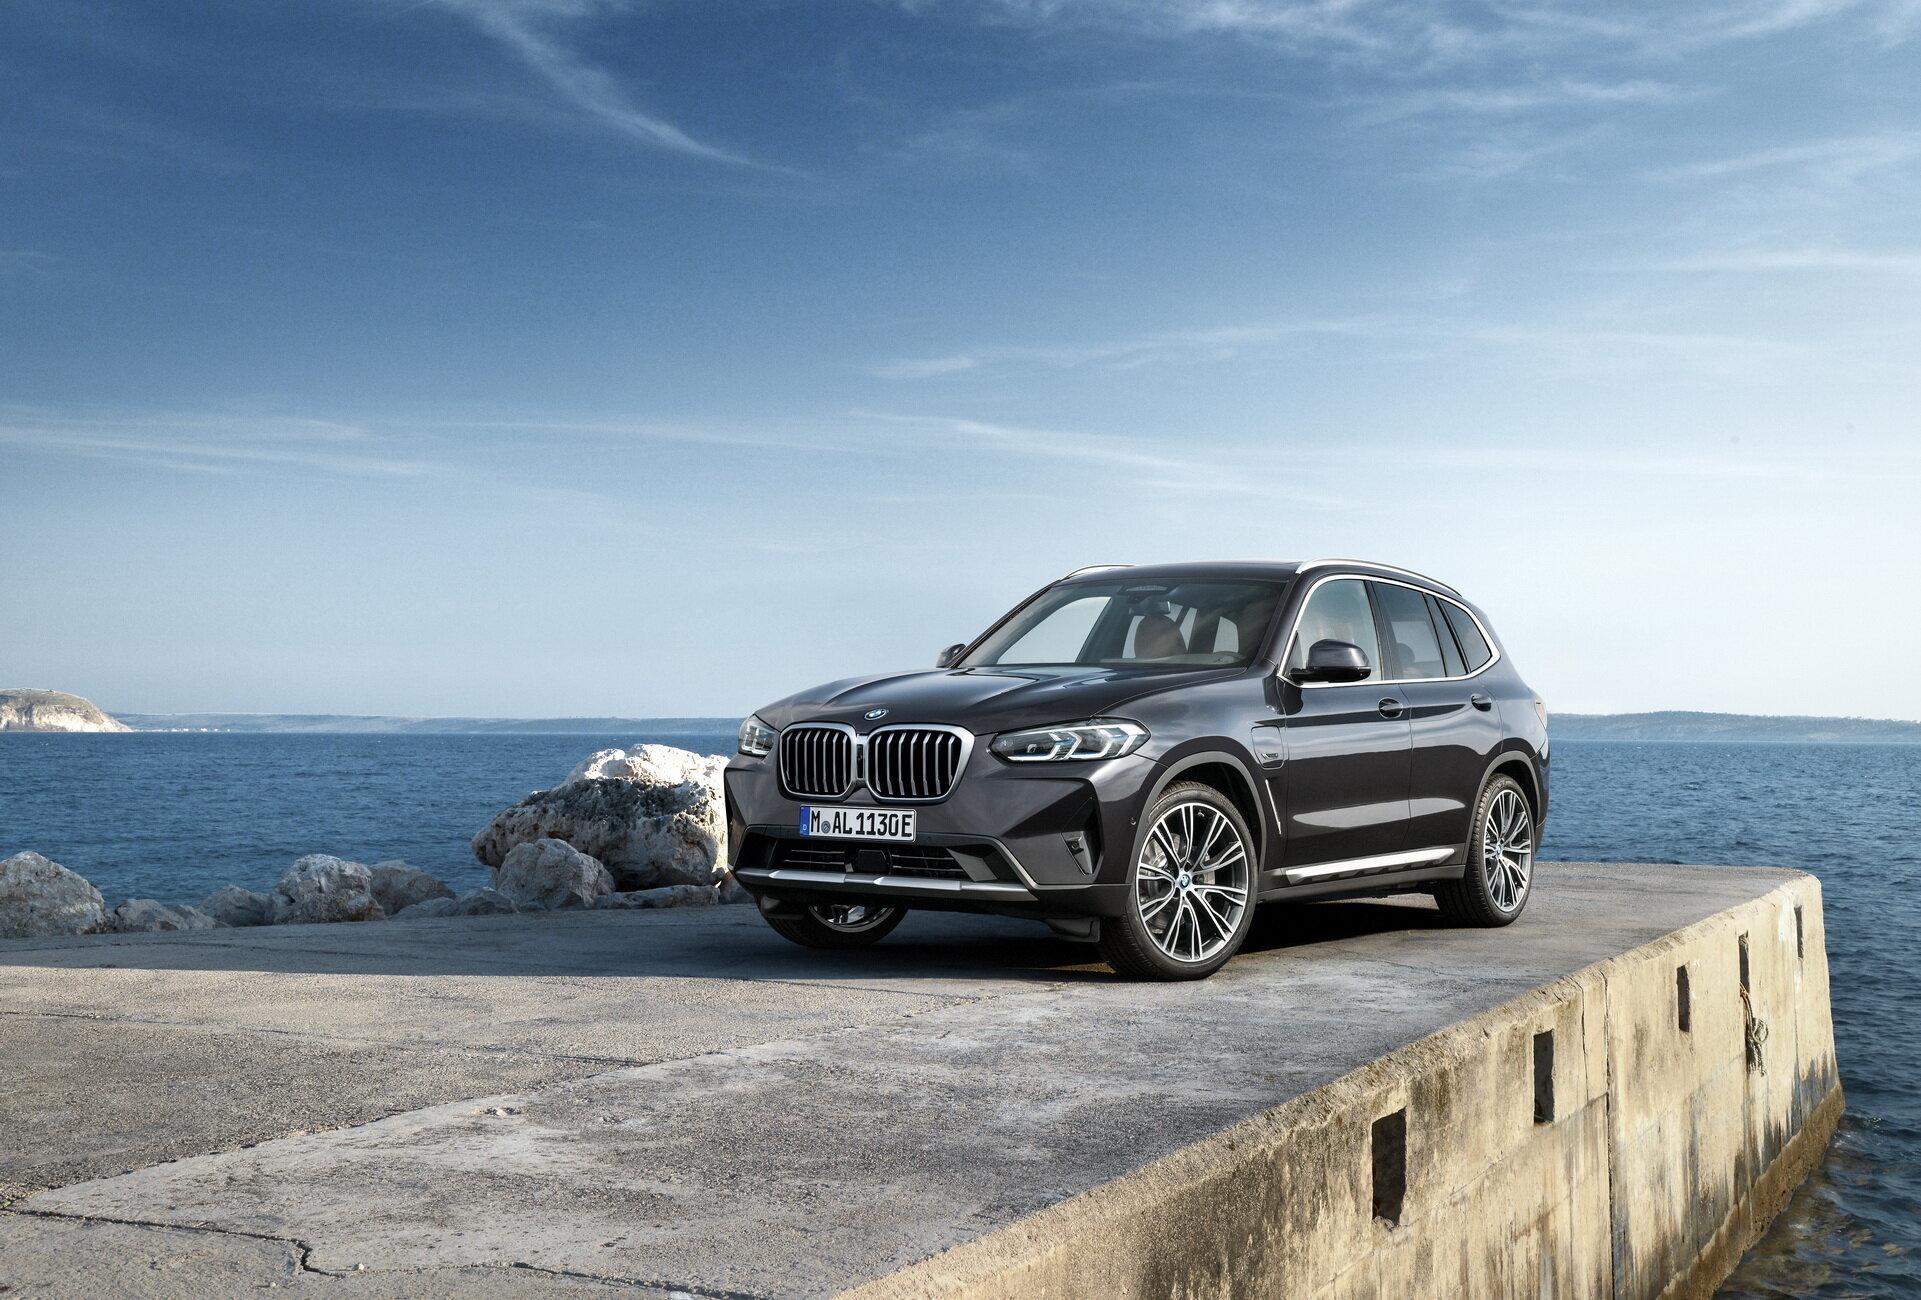 2022-BMW-X3-X4-32.jpg